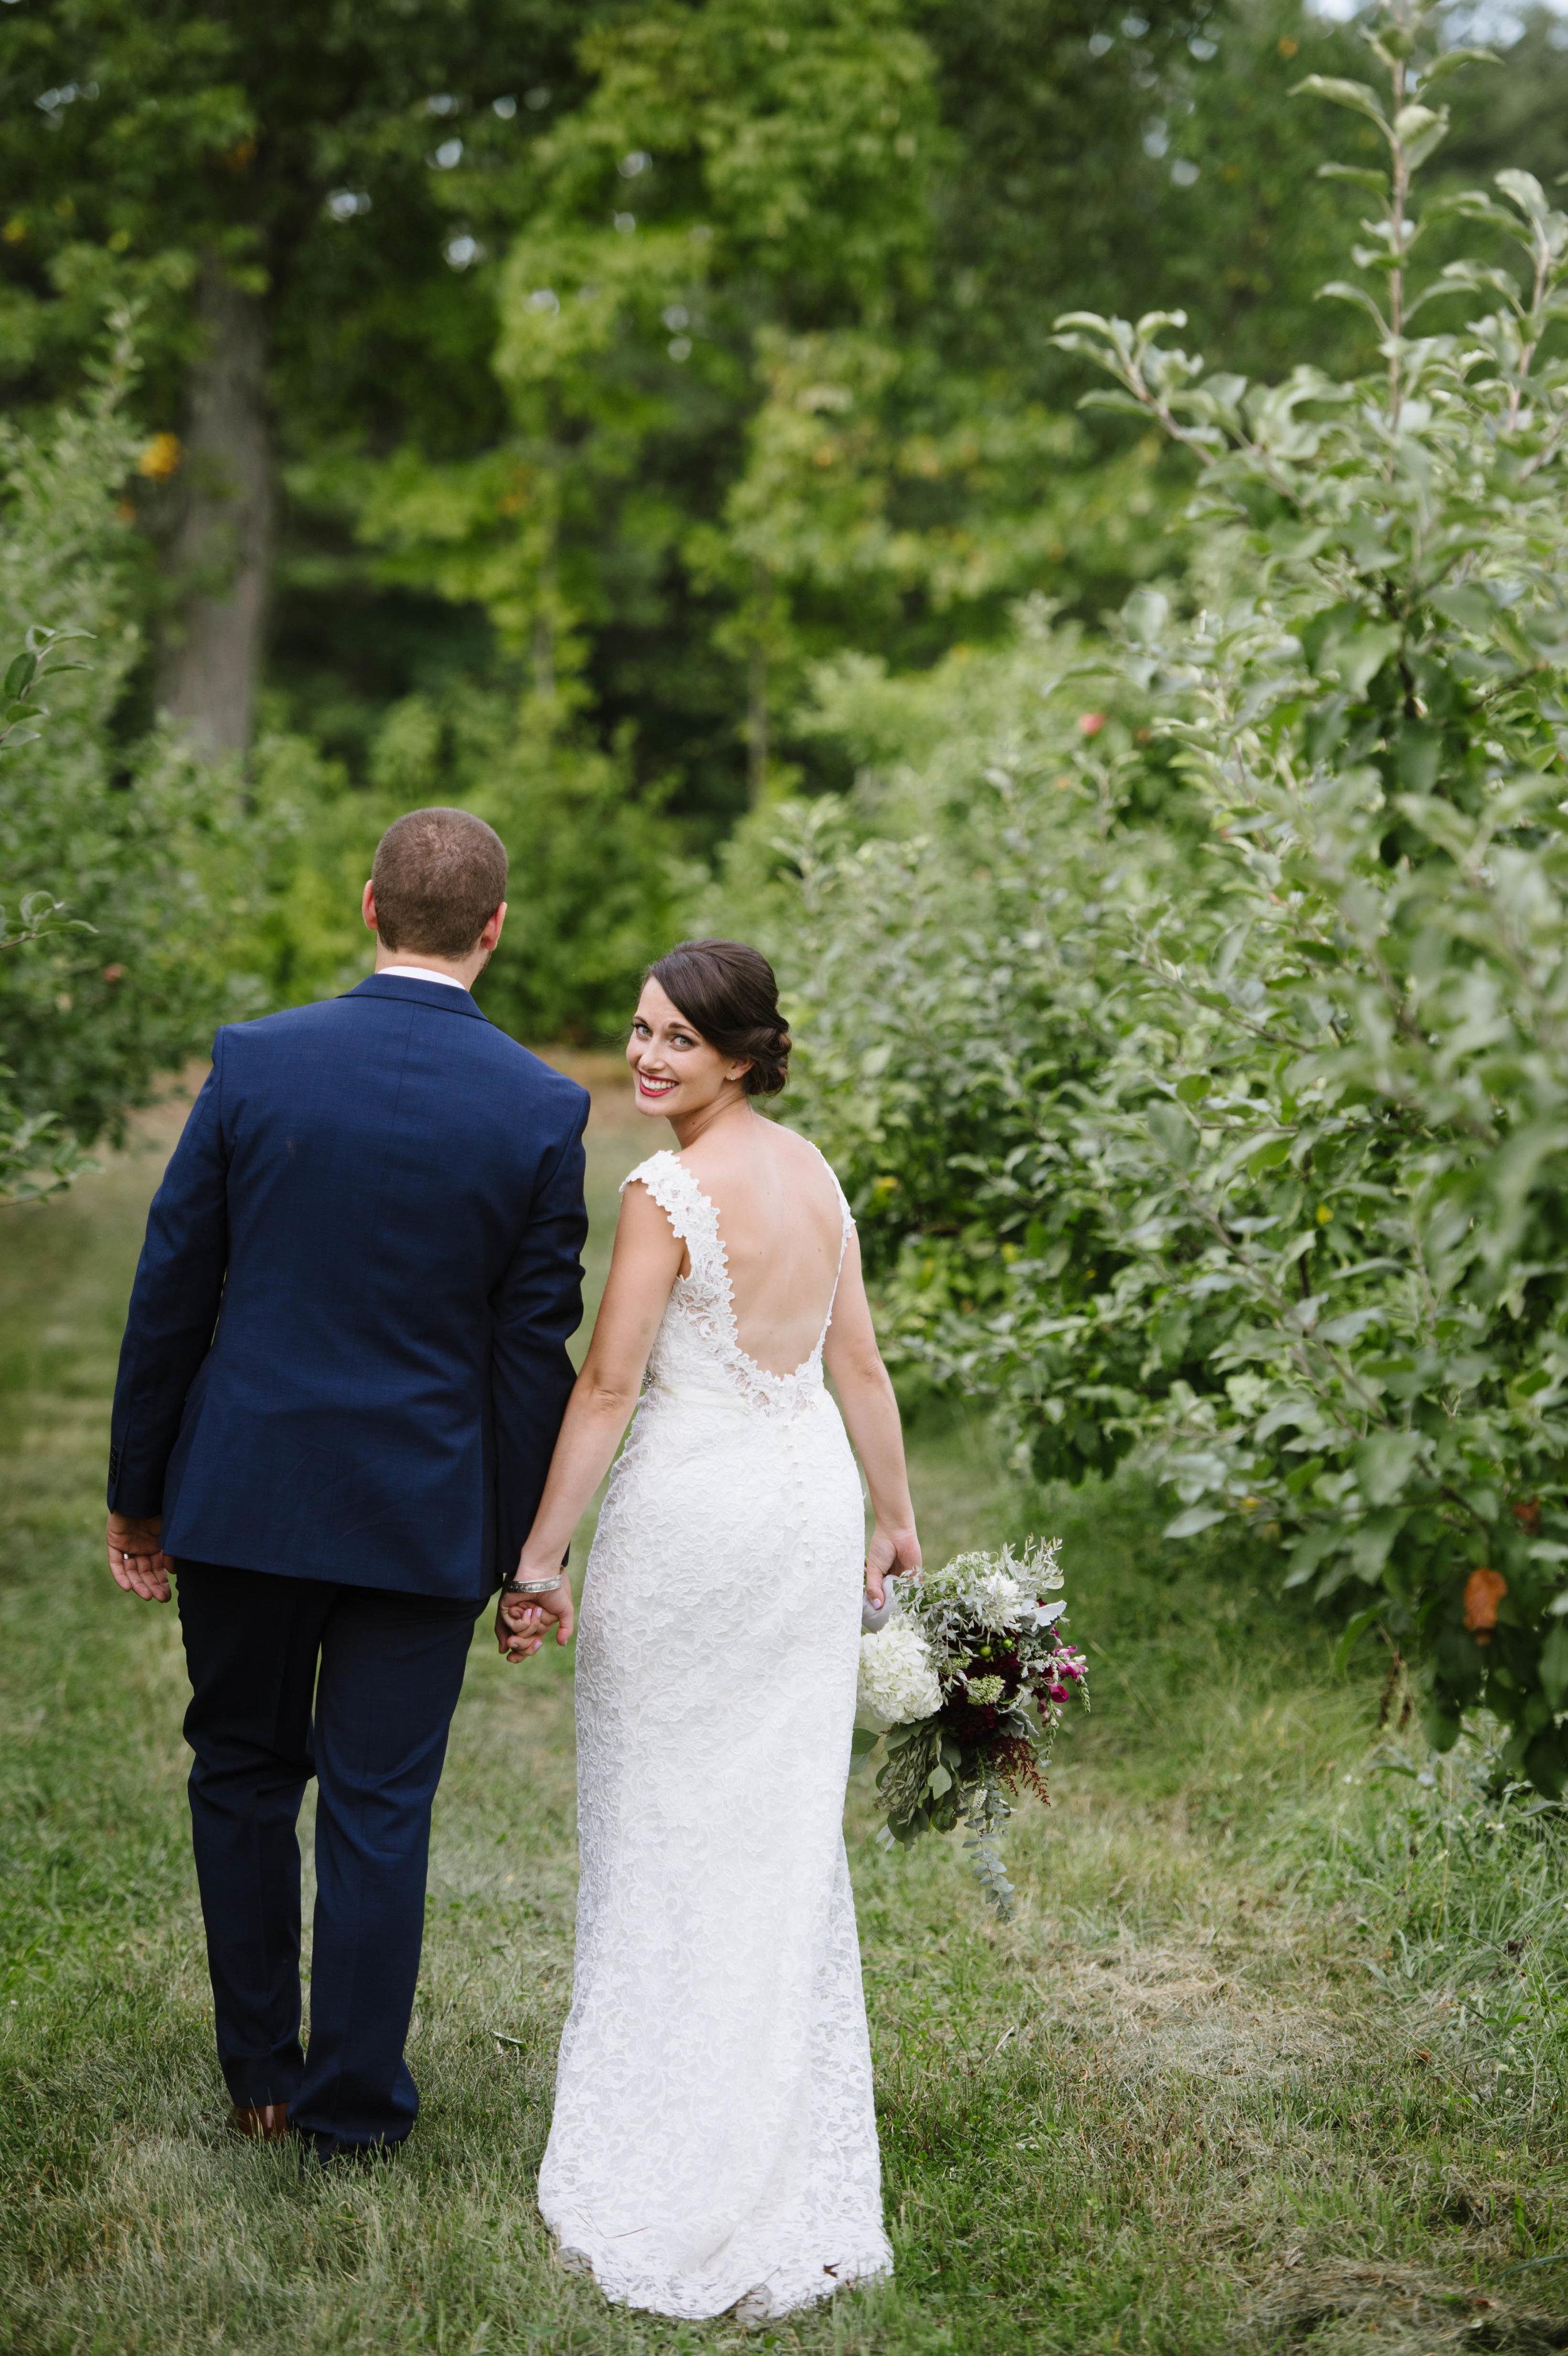 Candid-Wedding-Photography-Boston004.jpg